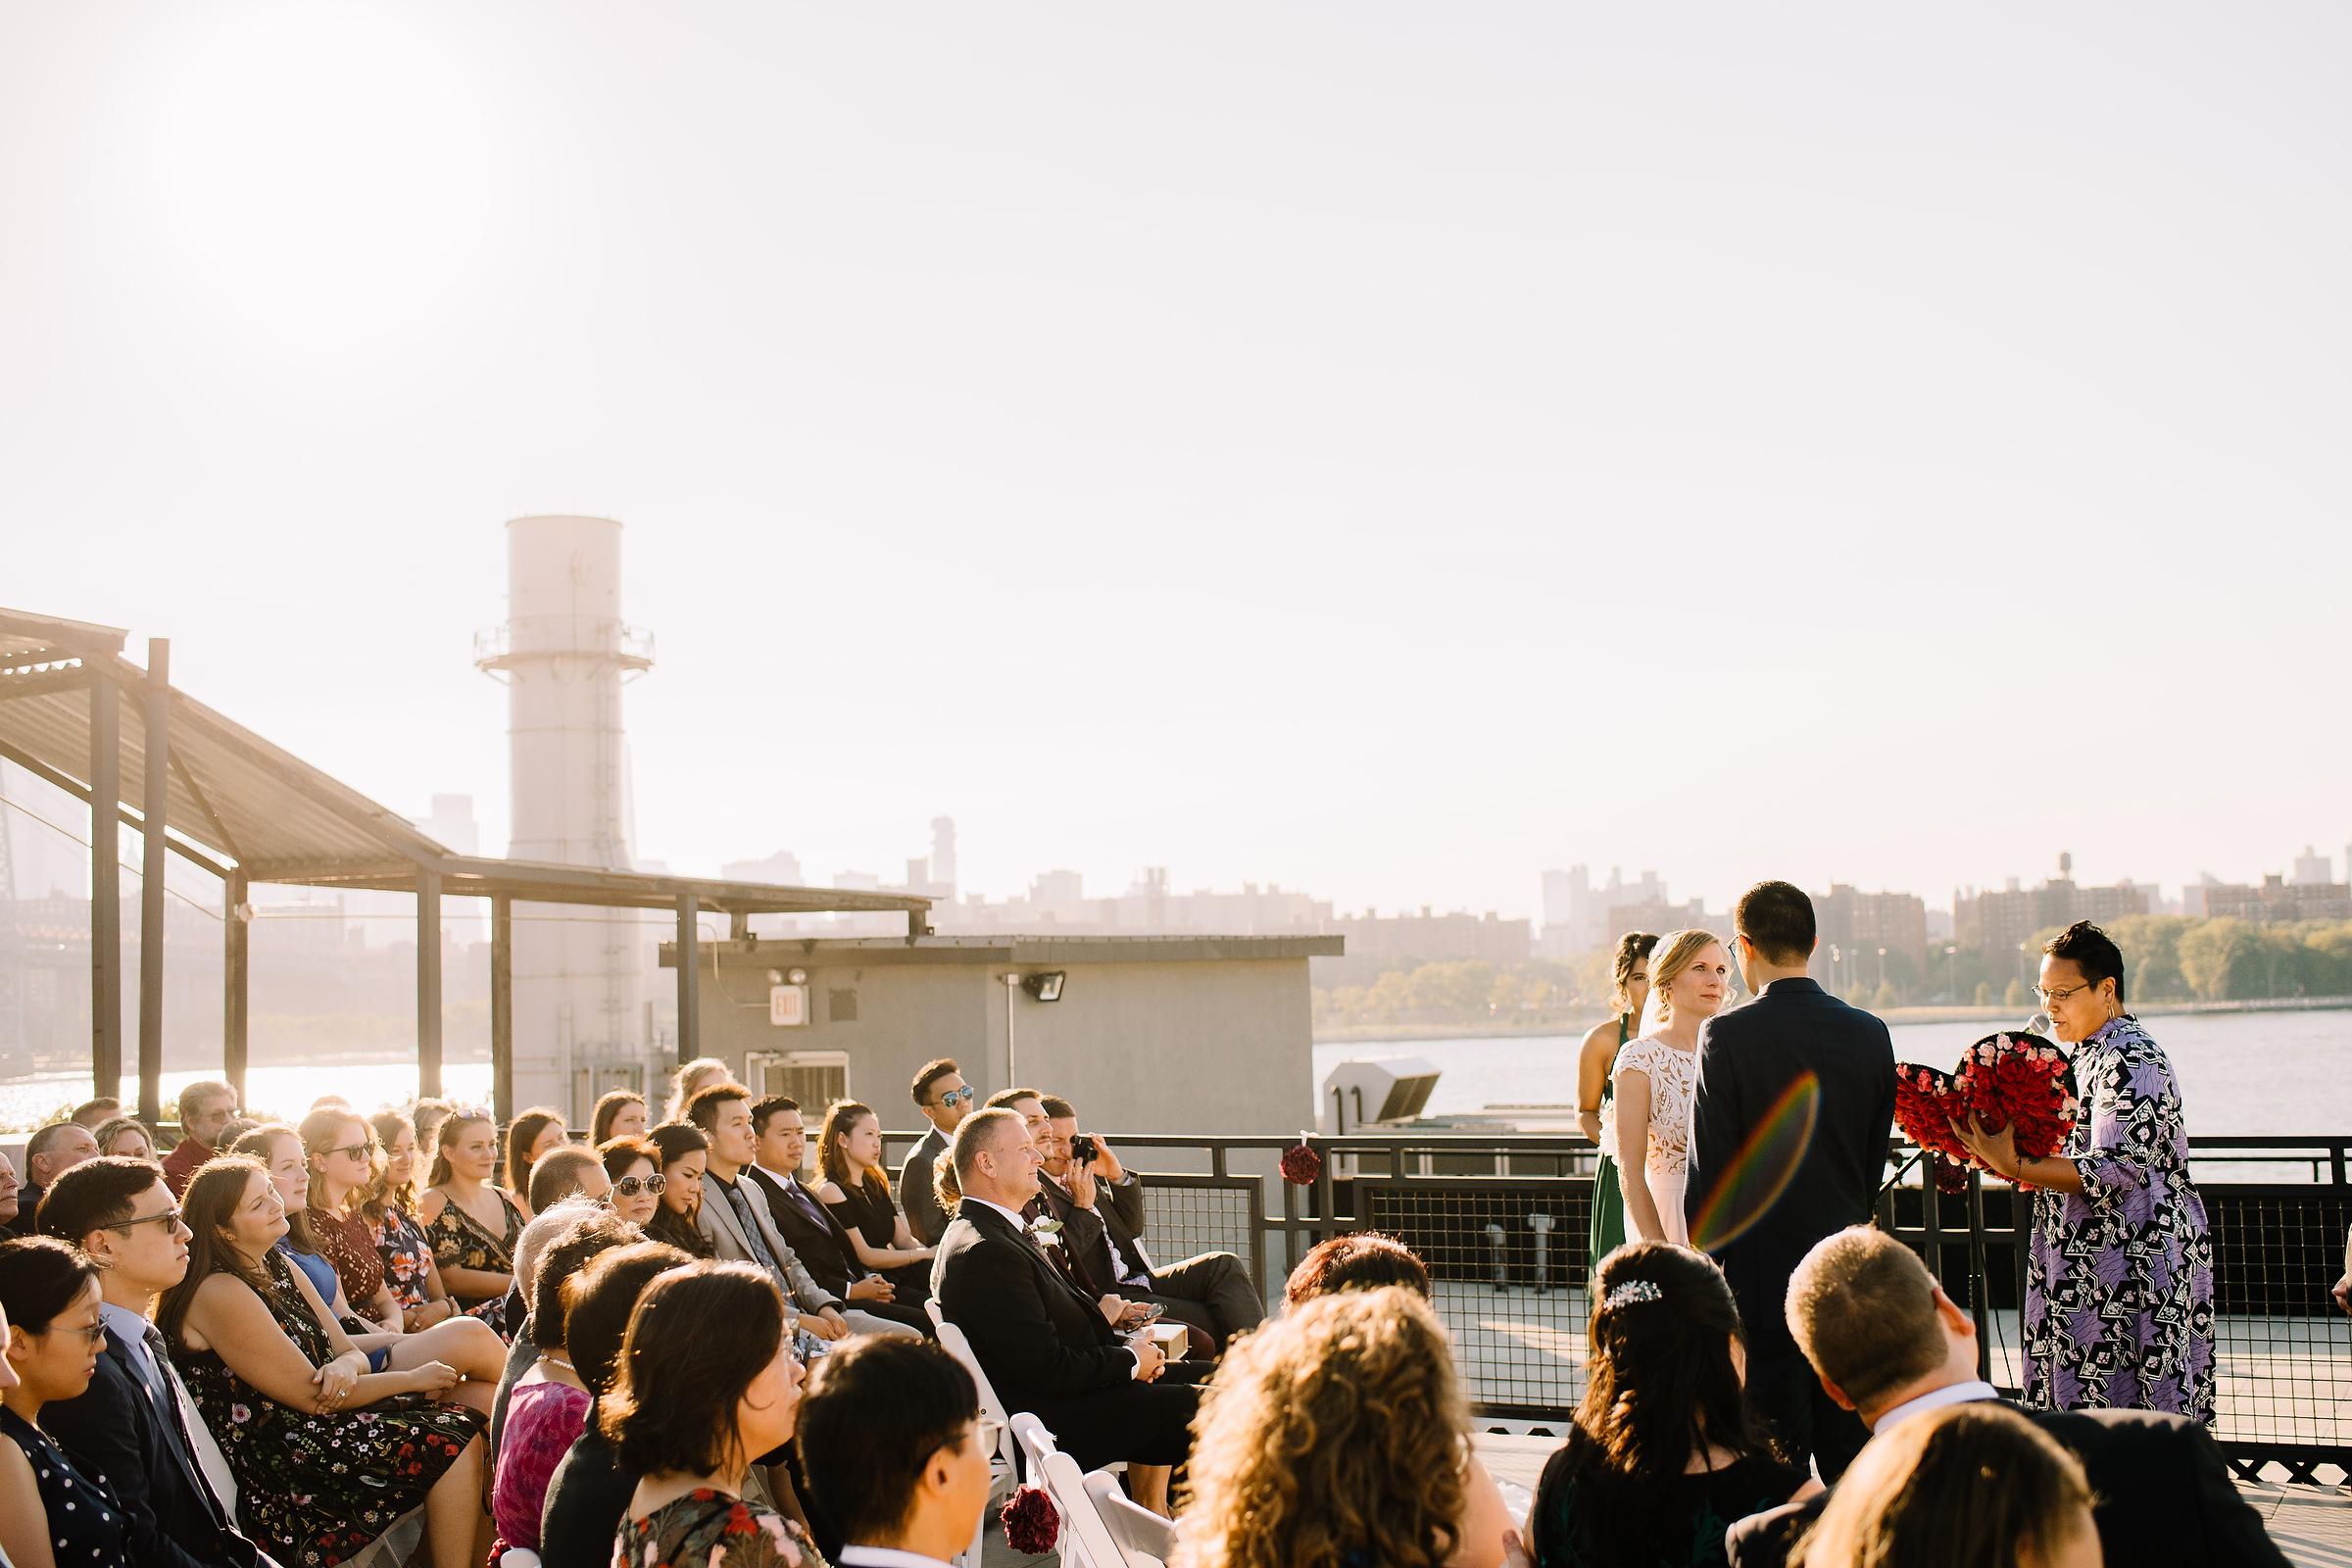 brooklyn bridge views from wedding ceremony